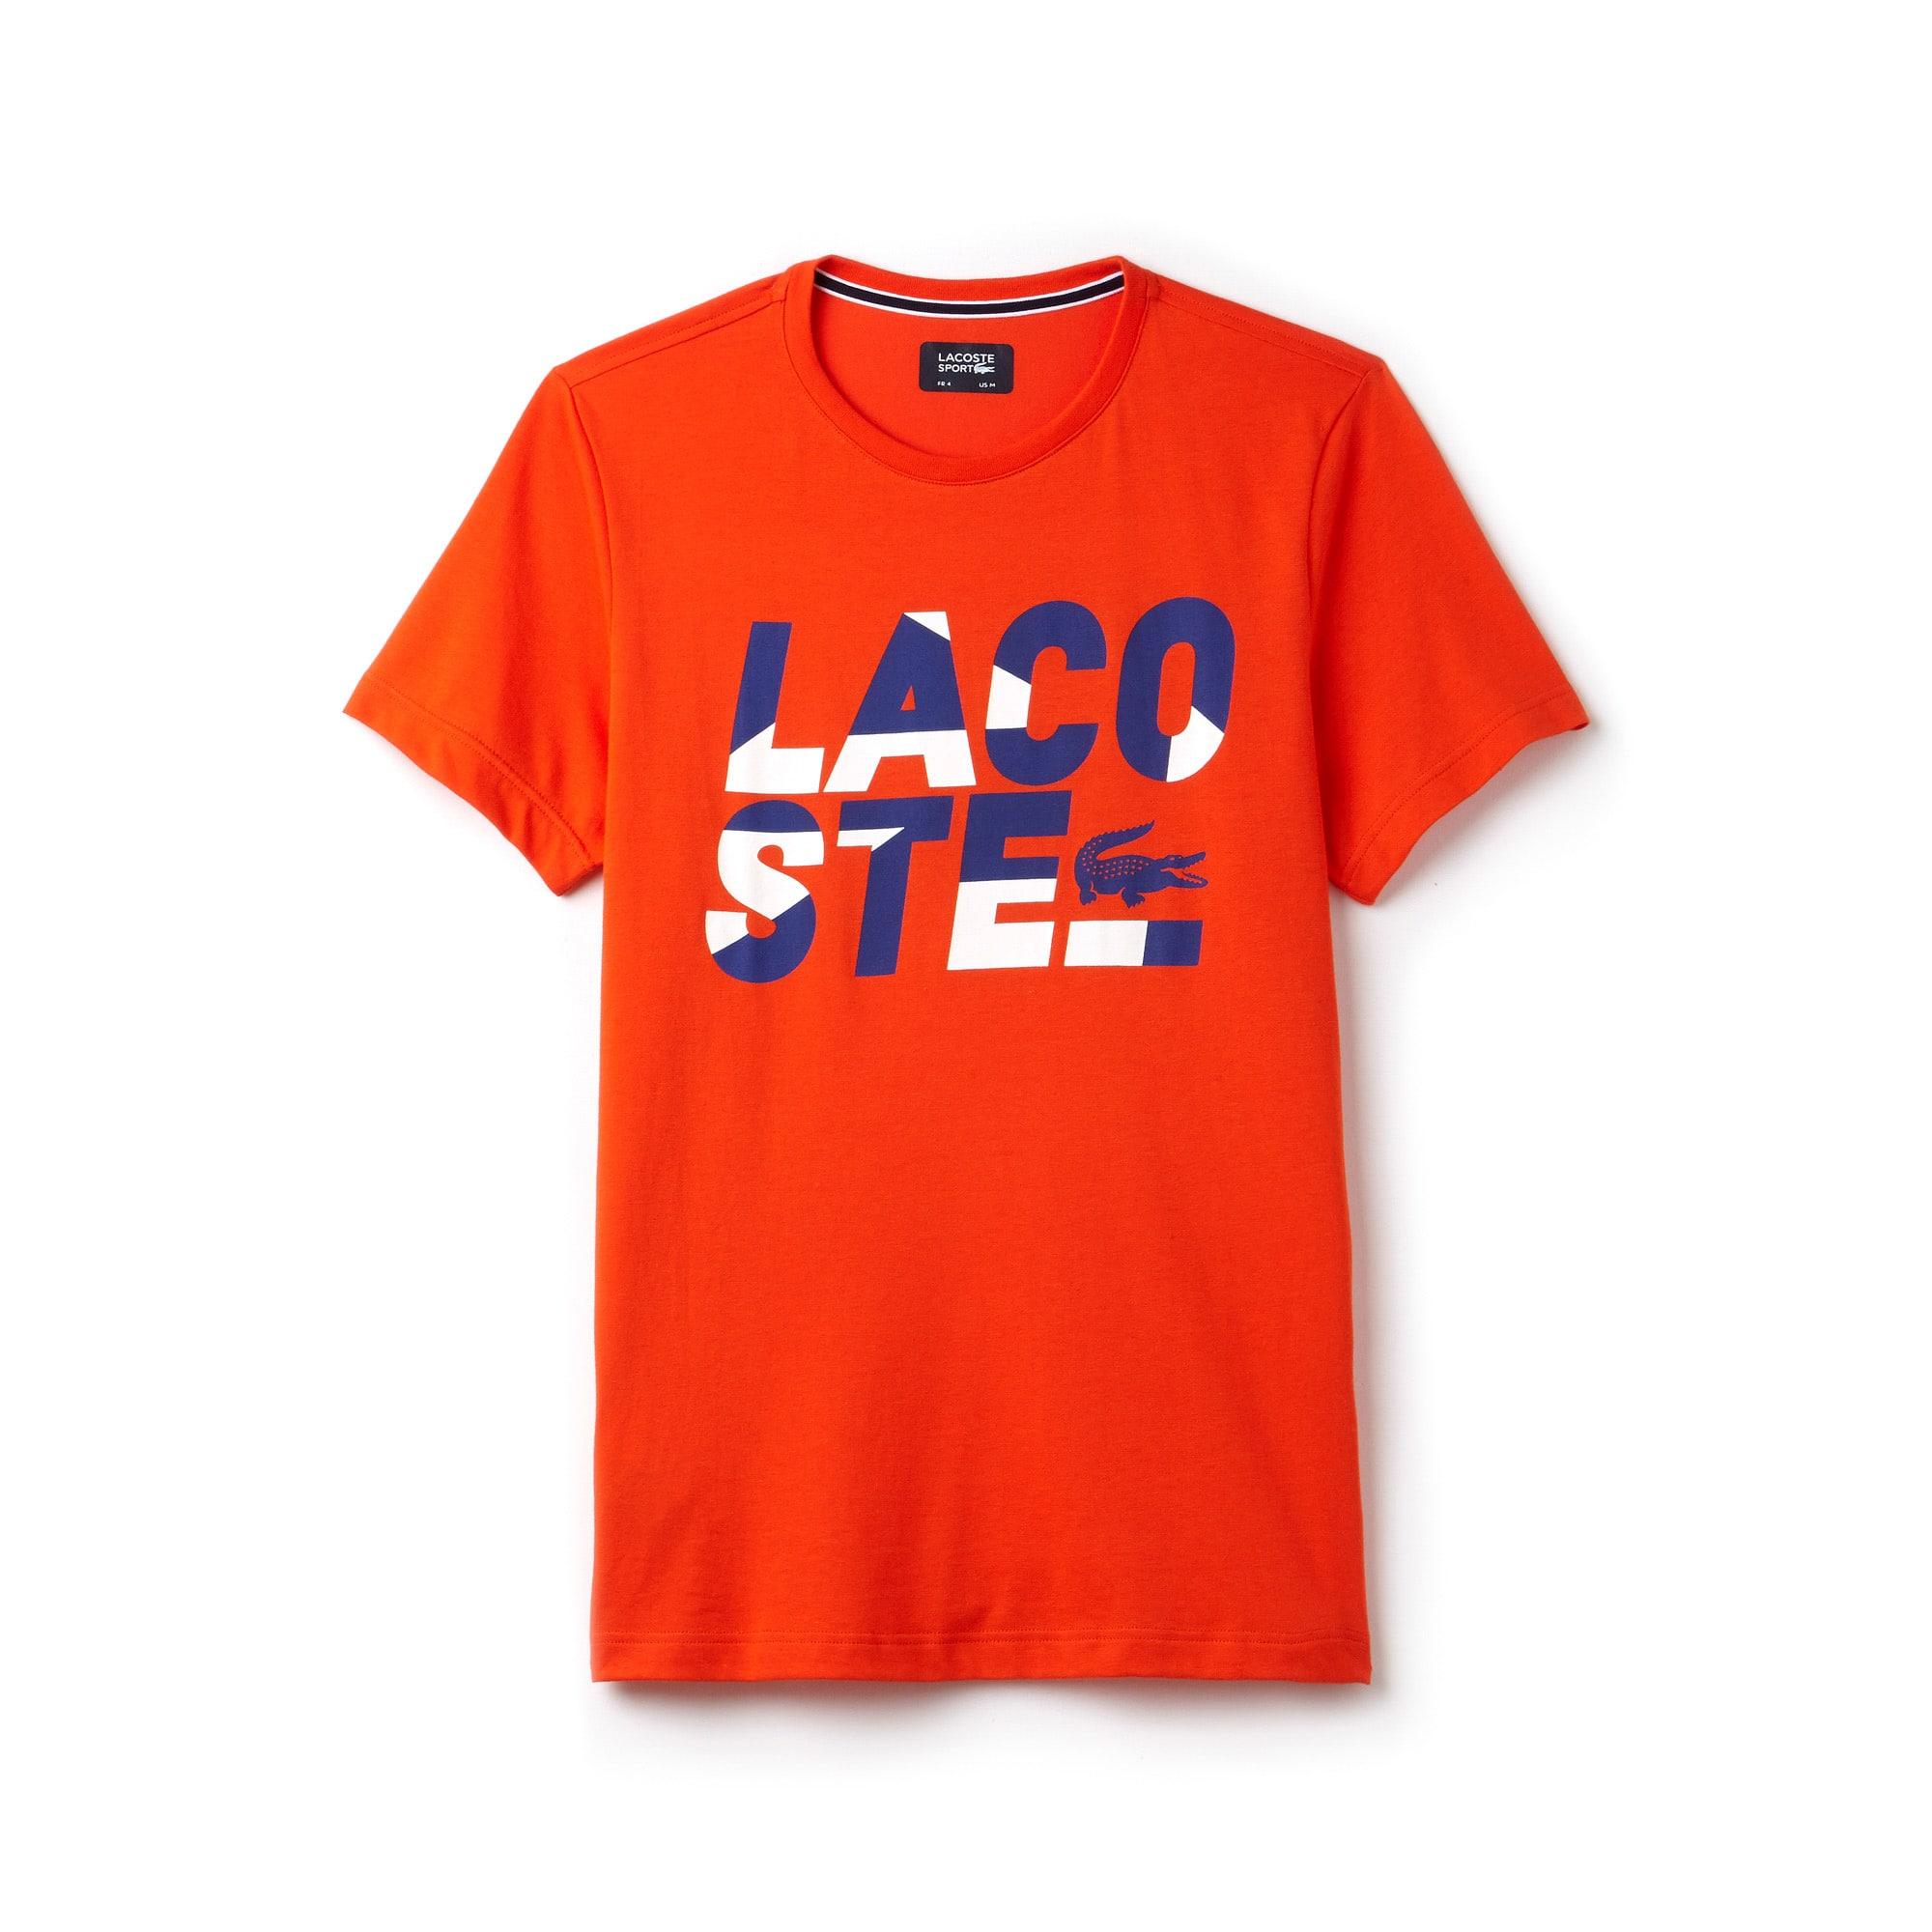 Herren-T-Shirt aus Funktionsjersey LACOSTE SPORT TENNIS